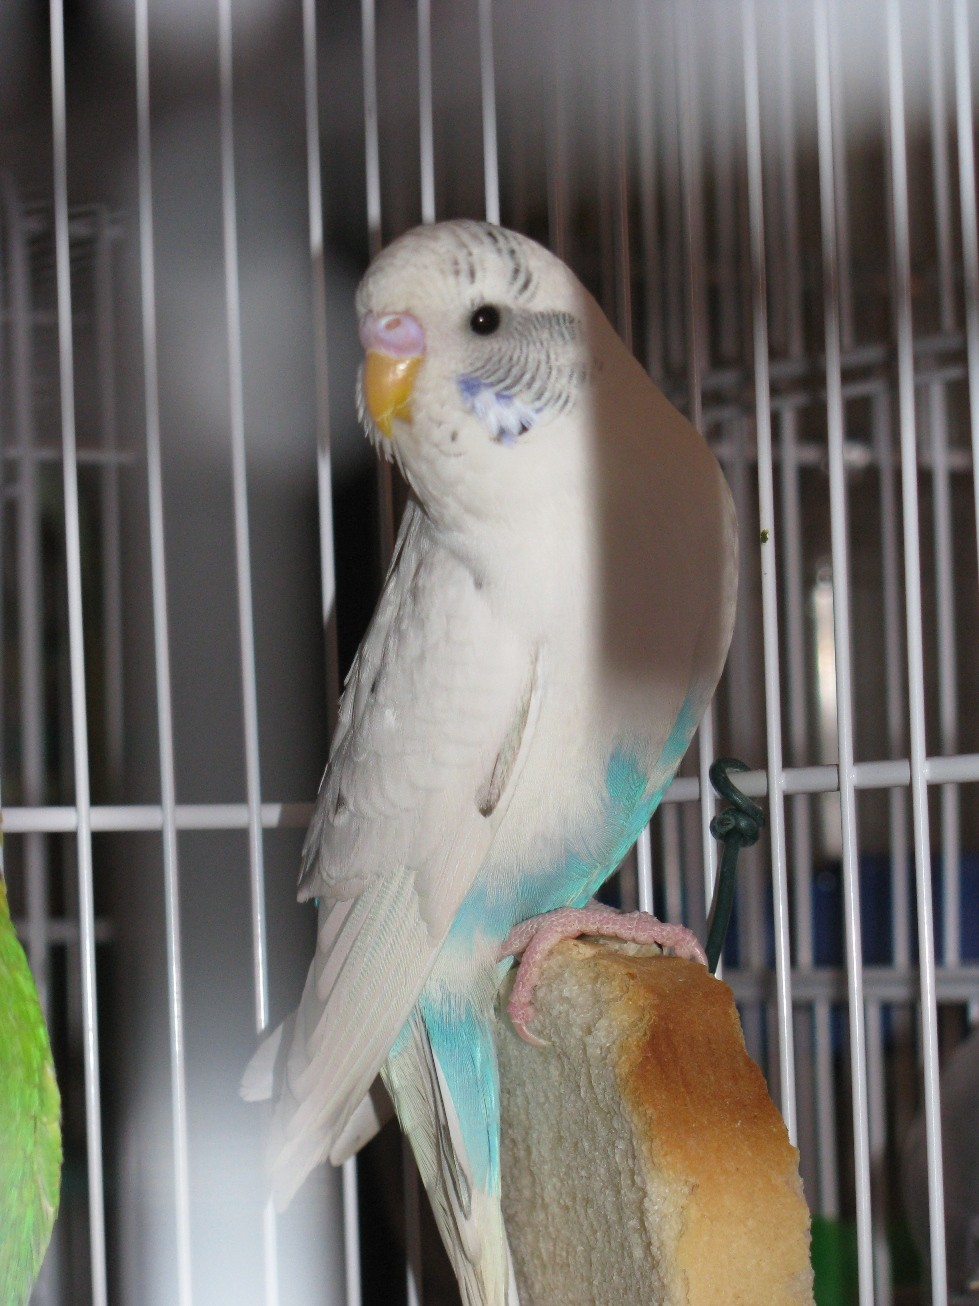 Azzurro opalino. Q2310